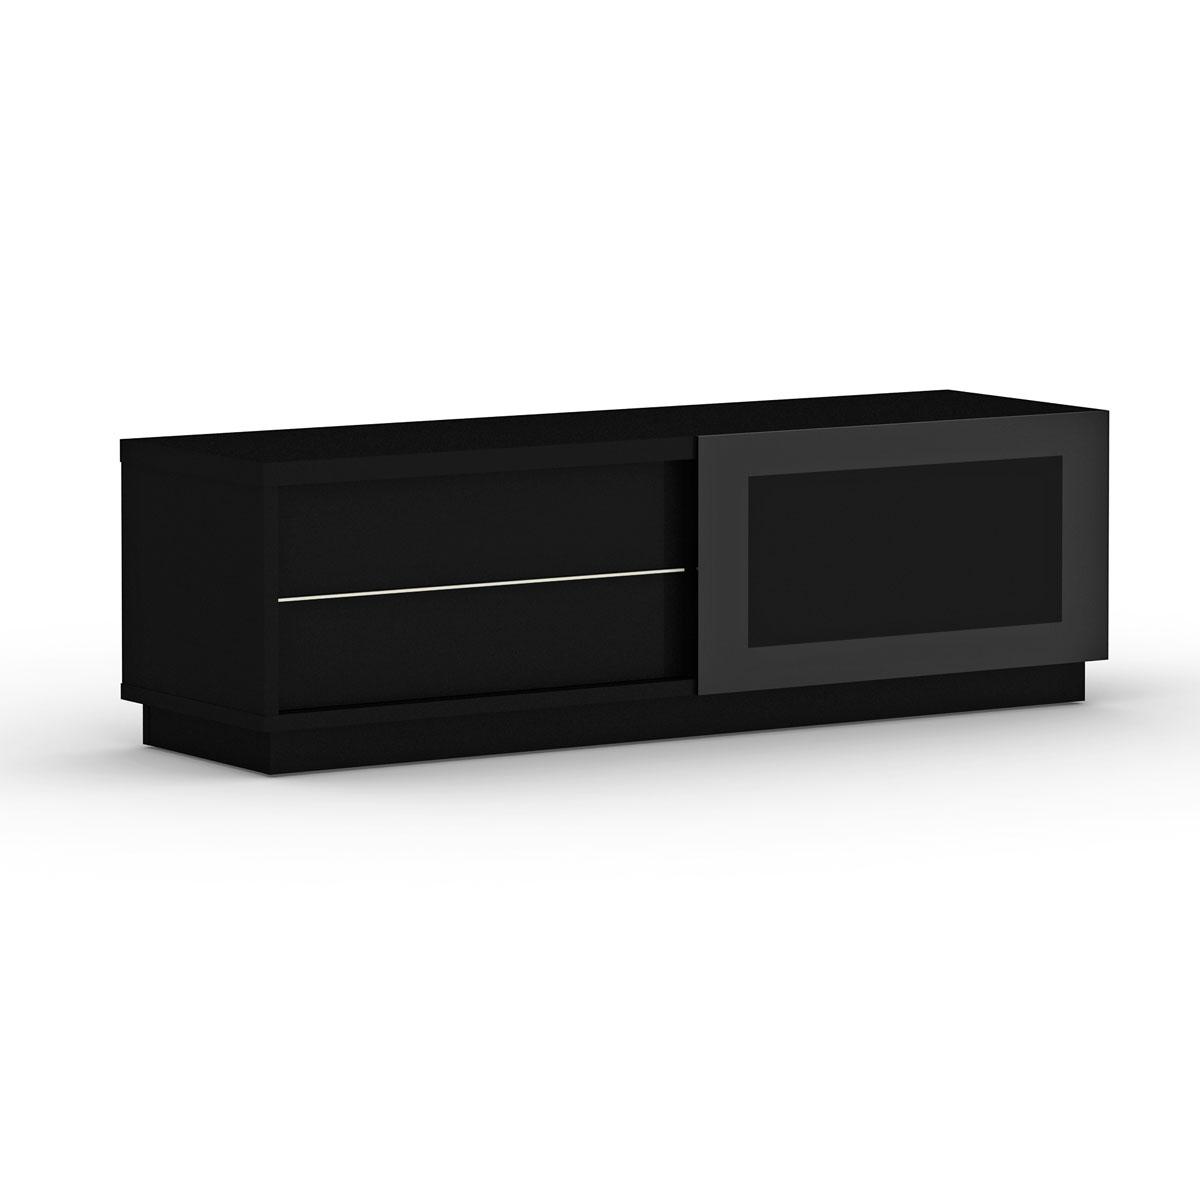 Elmob harmony ha 160 02 noir meuble tv elmob sur ldlc - Meuble pour ecran plat ...